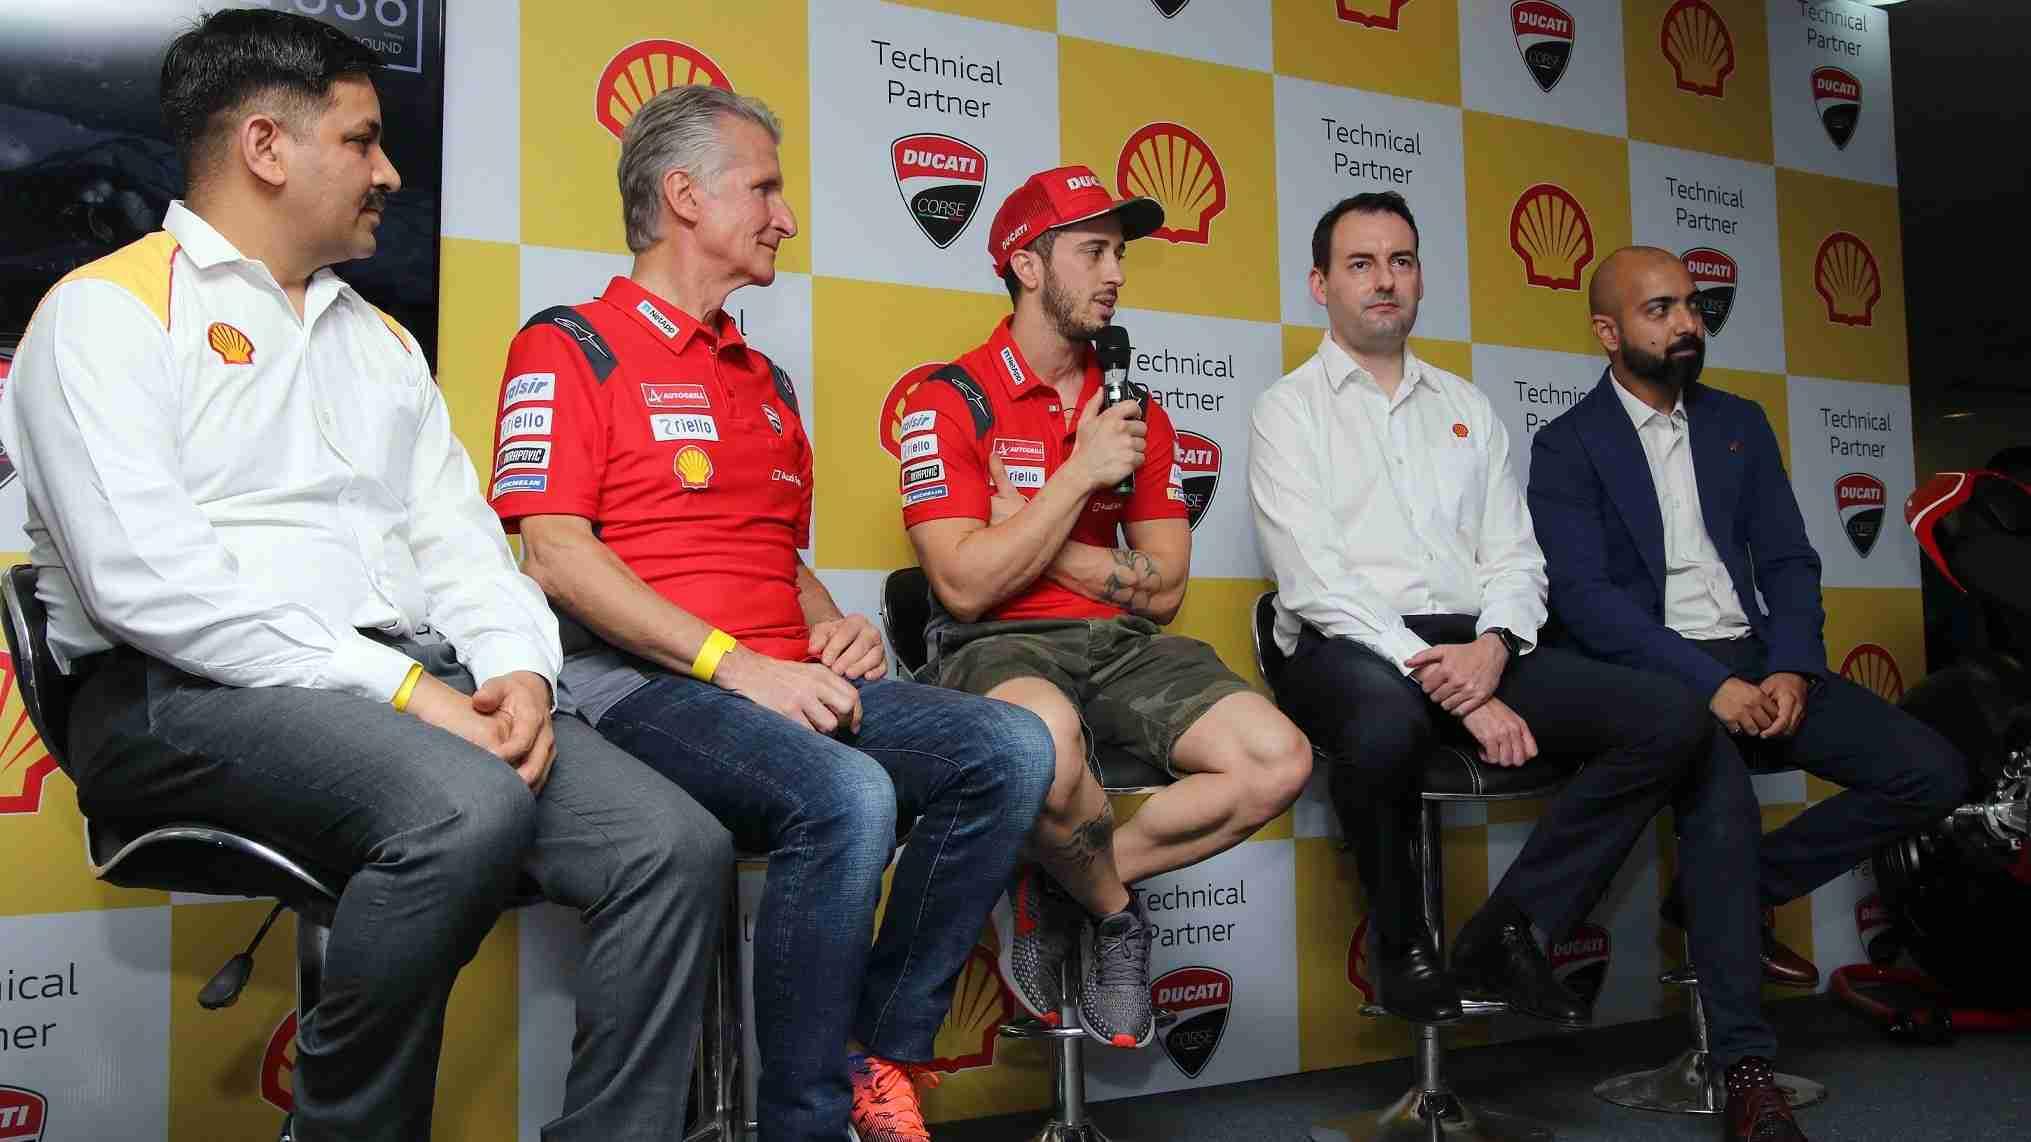 Shell Ducati Riders Day